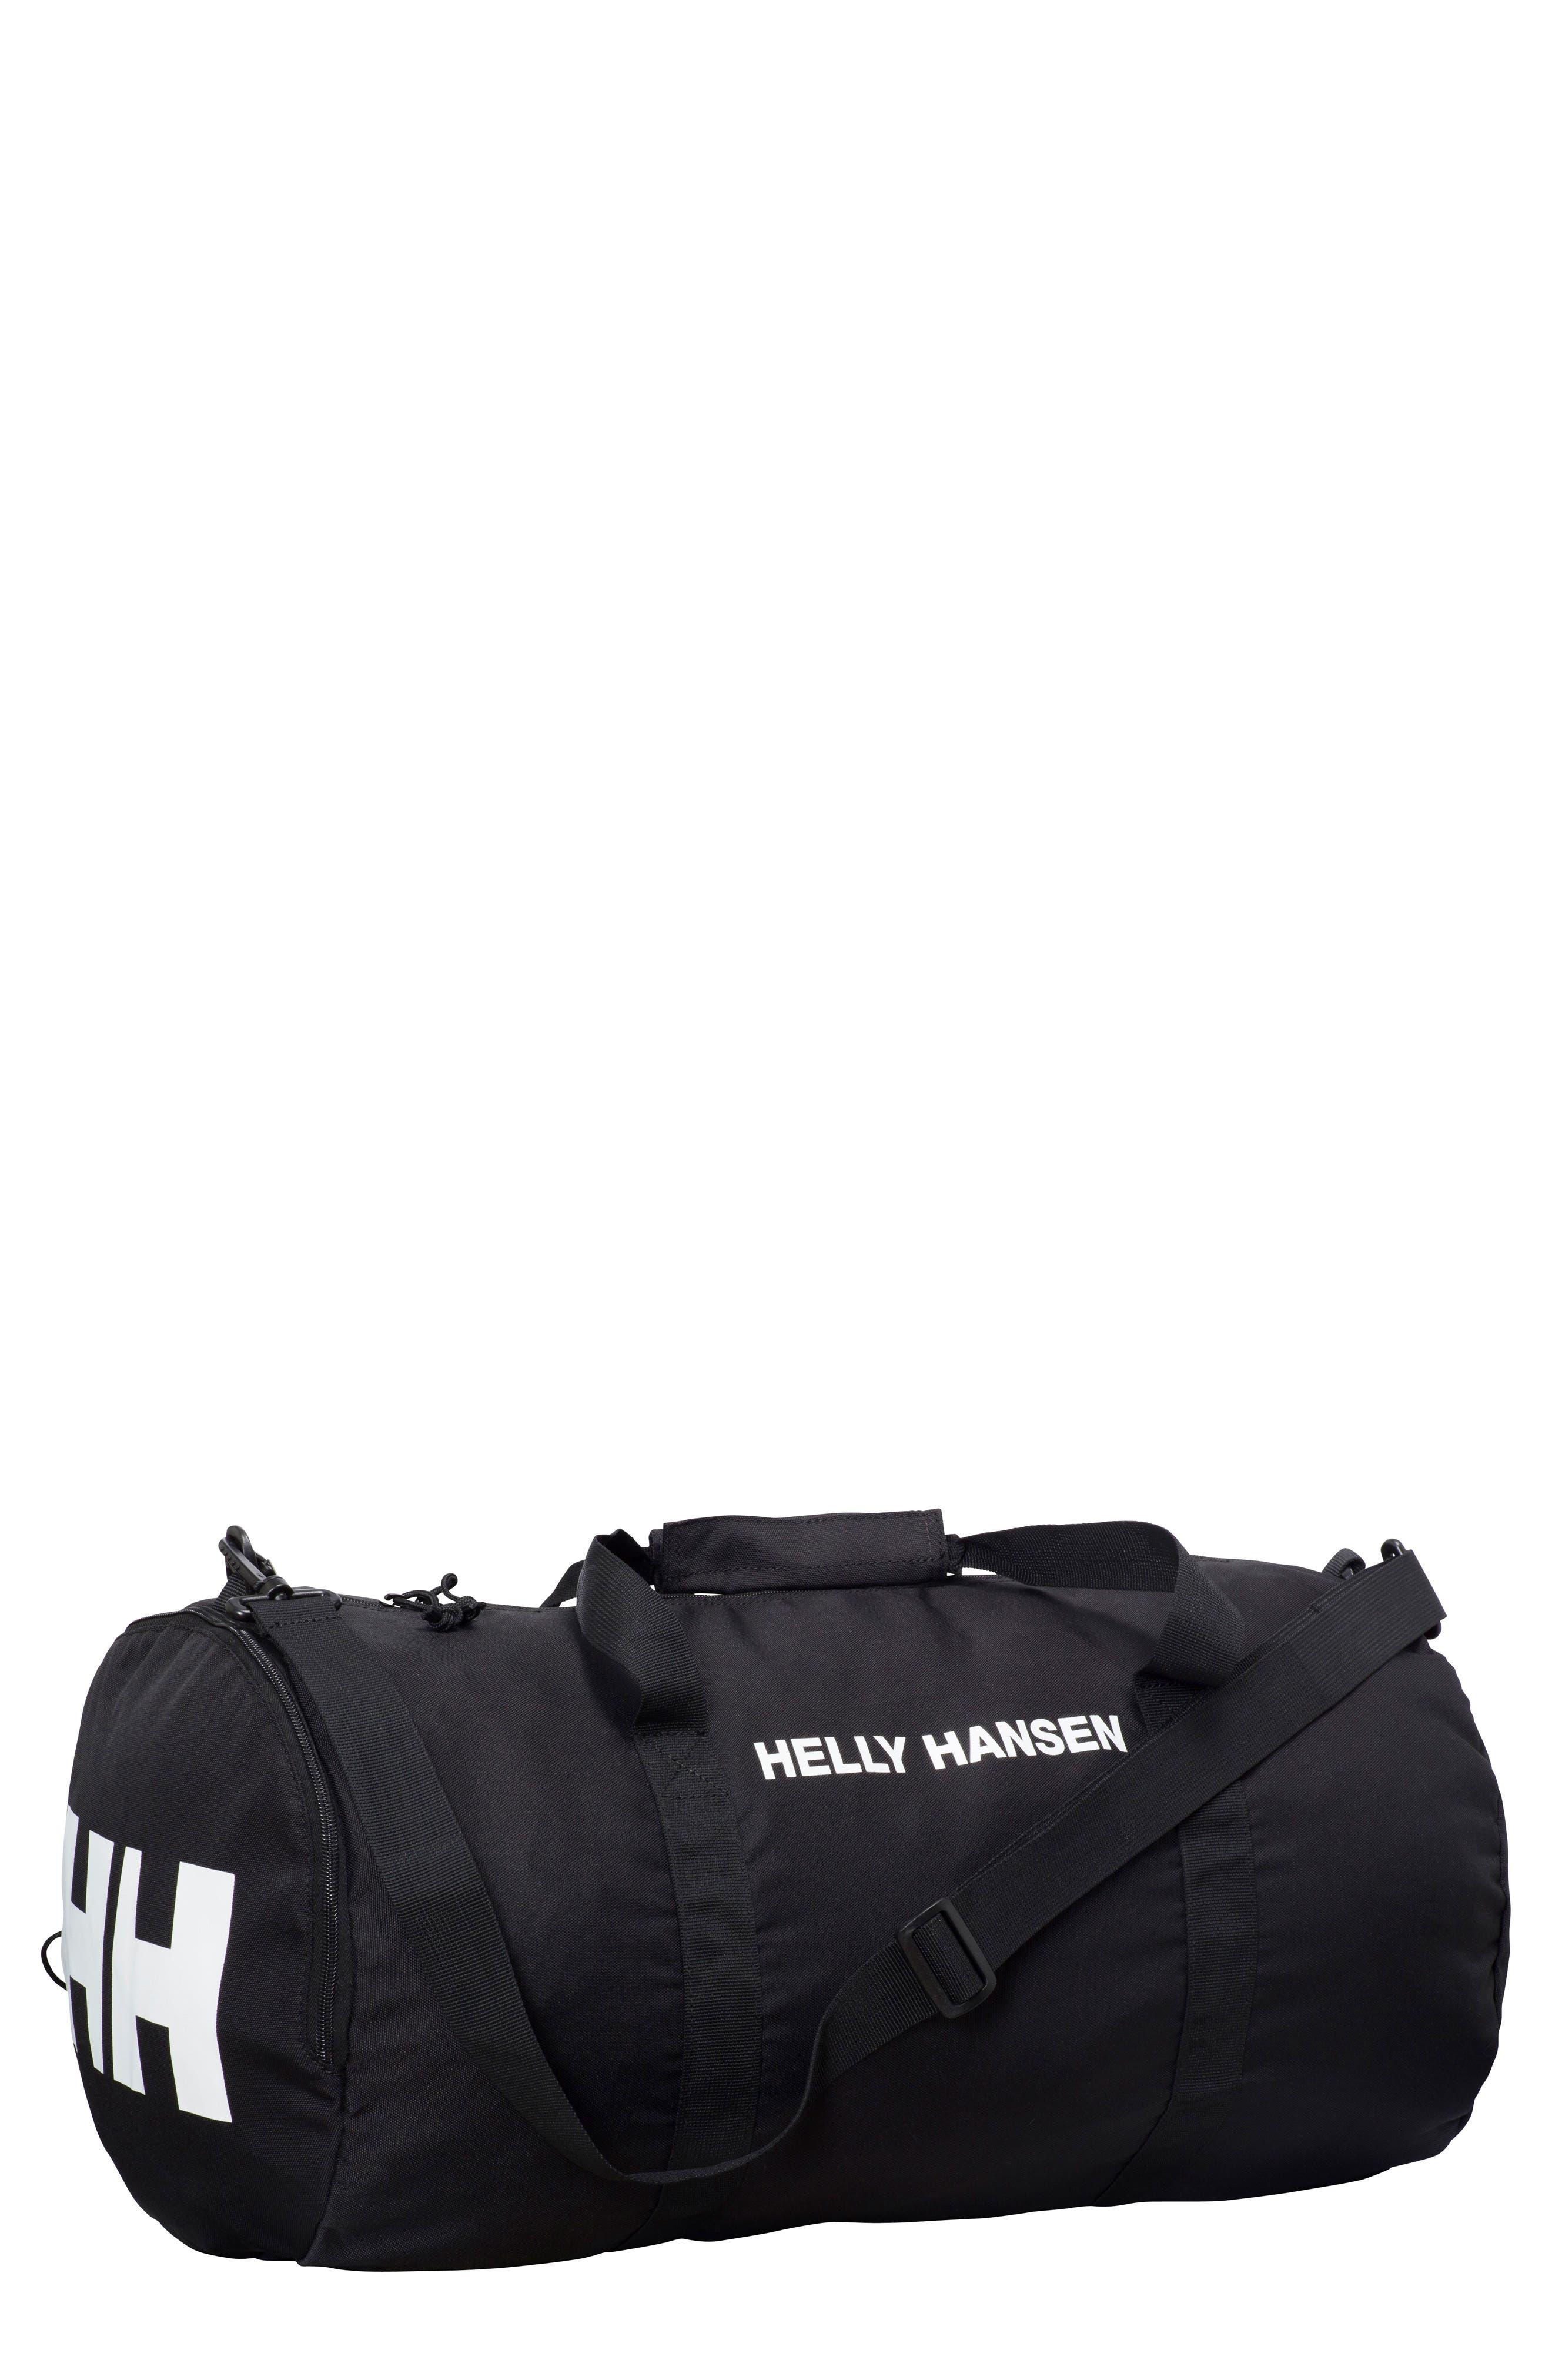 Medium Packable Duffel Bag,                         Main,                         color, 009